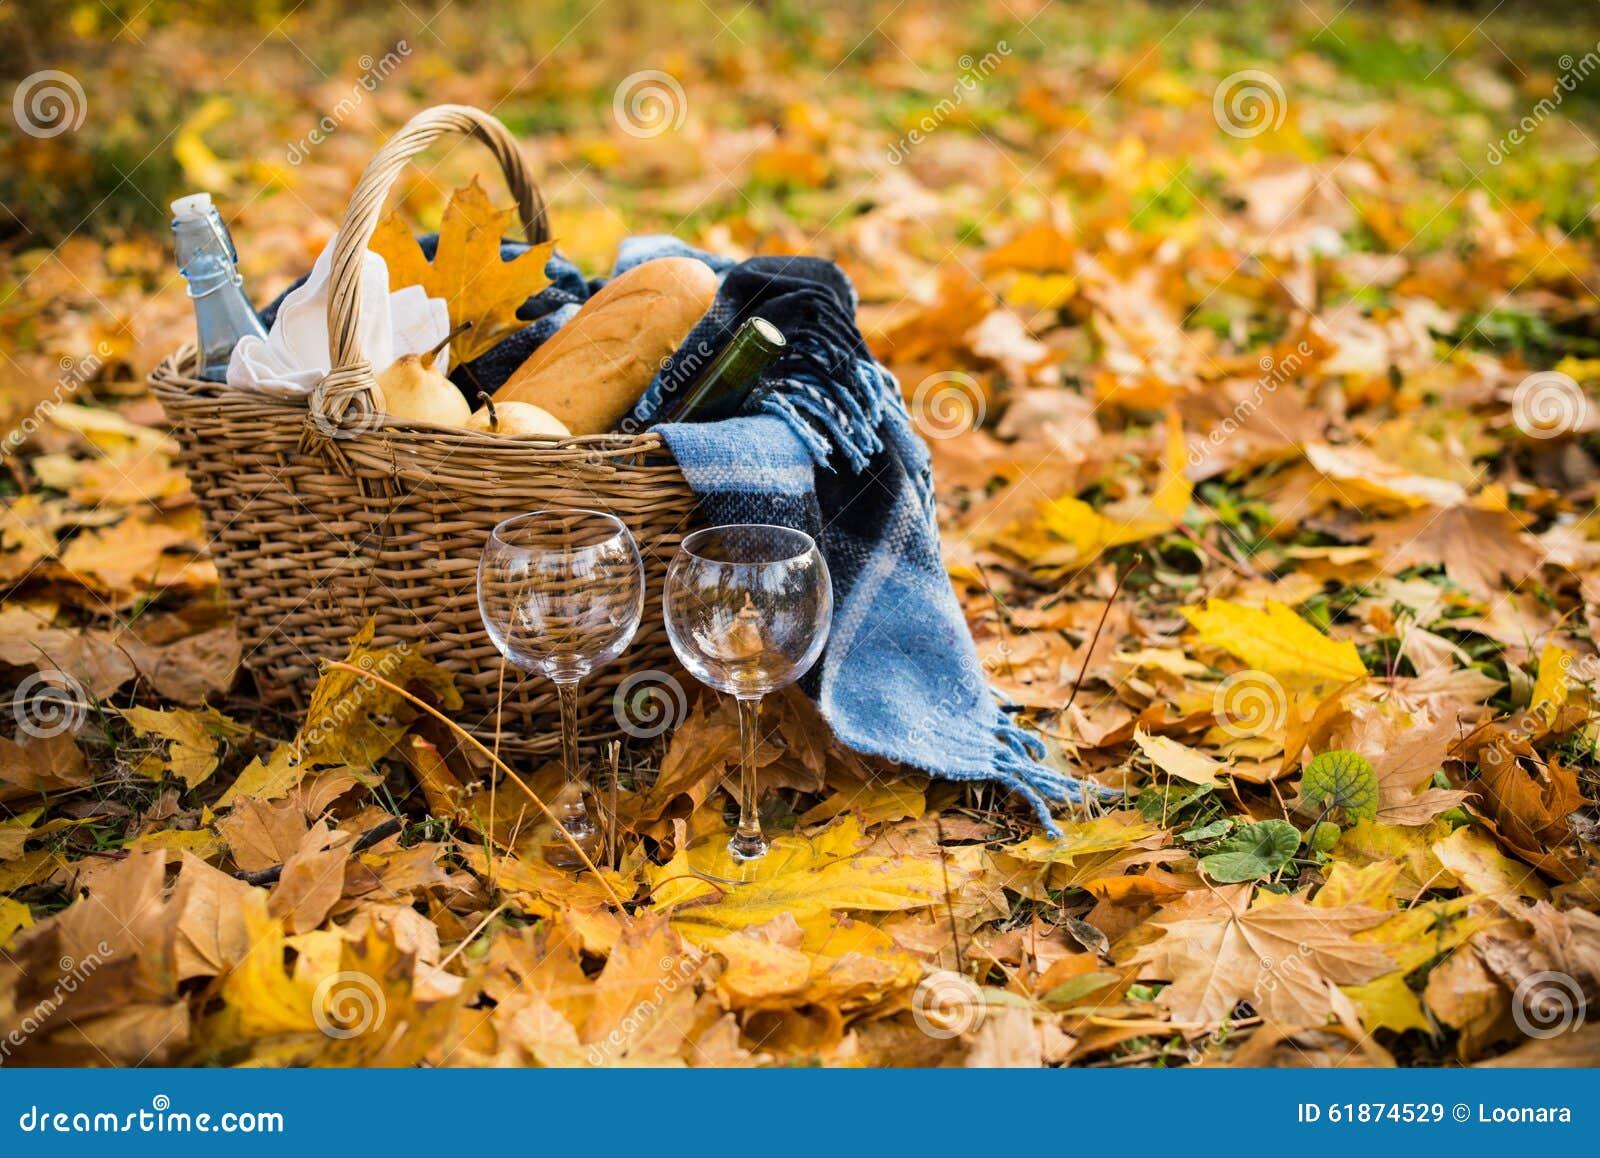 Пикник осень картинки